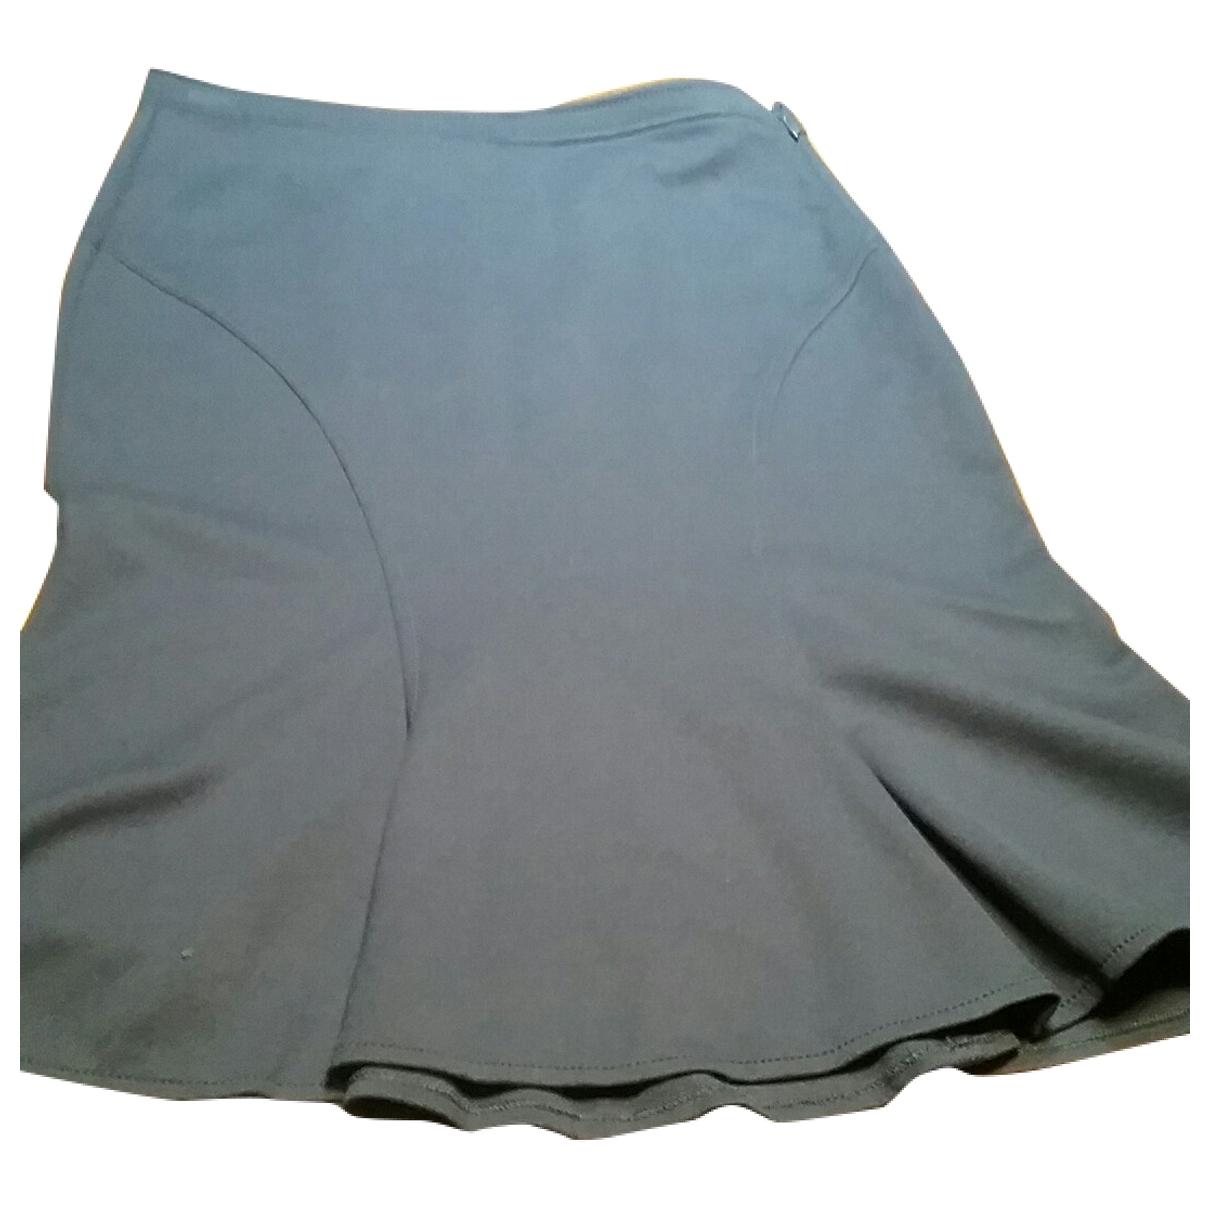 Armani Collezioni \N Blue skirt for Women 38 IT